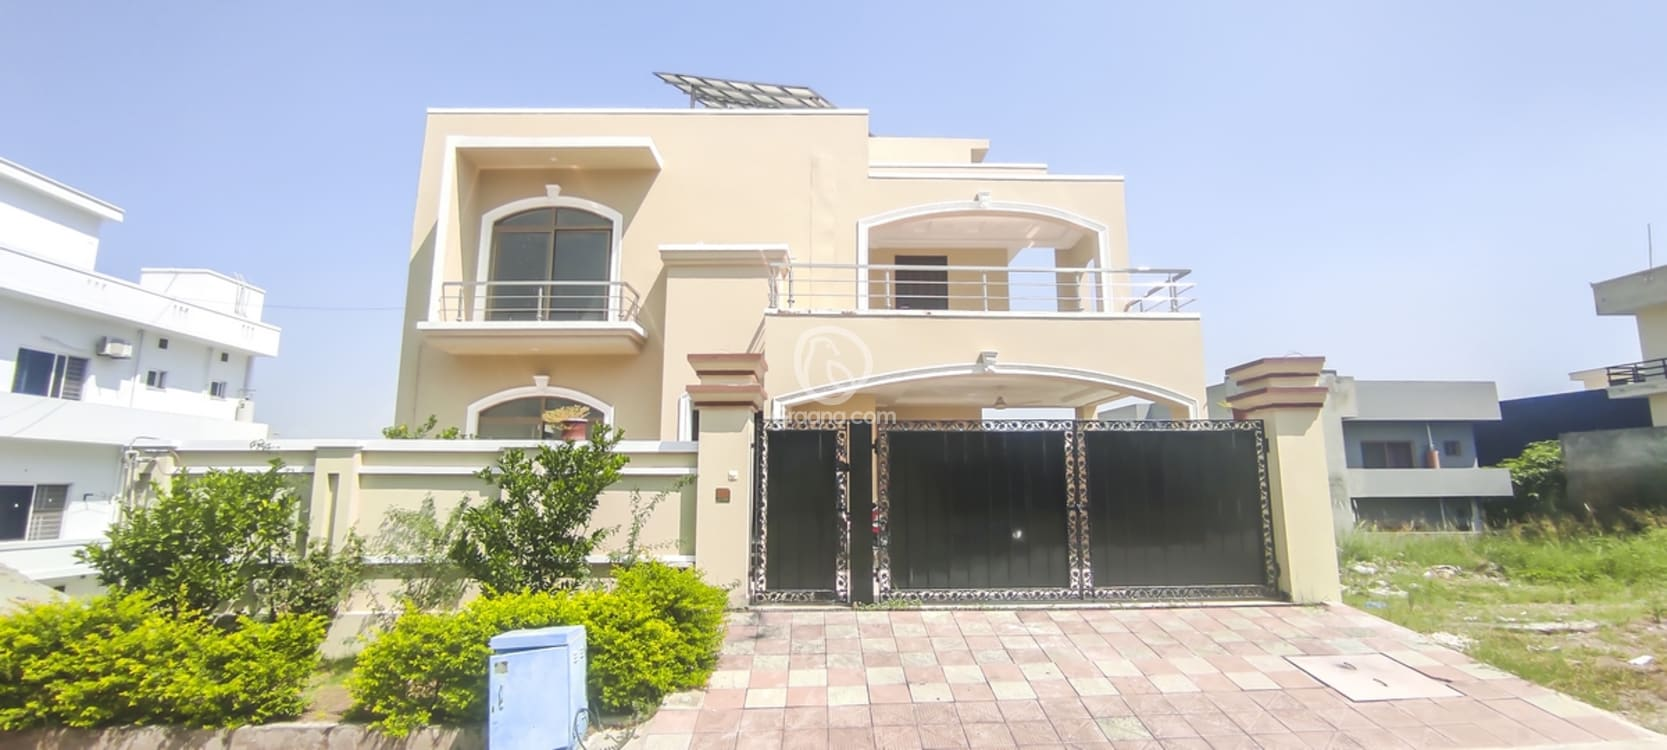 24 Marla House For Sale | Graana.com